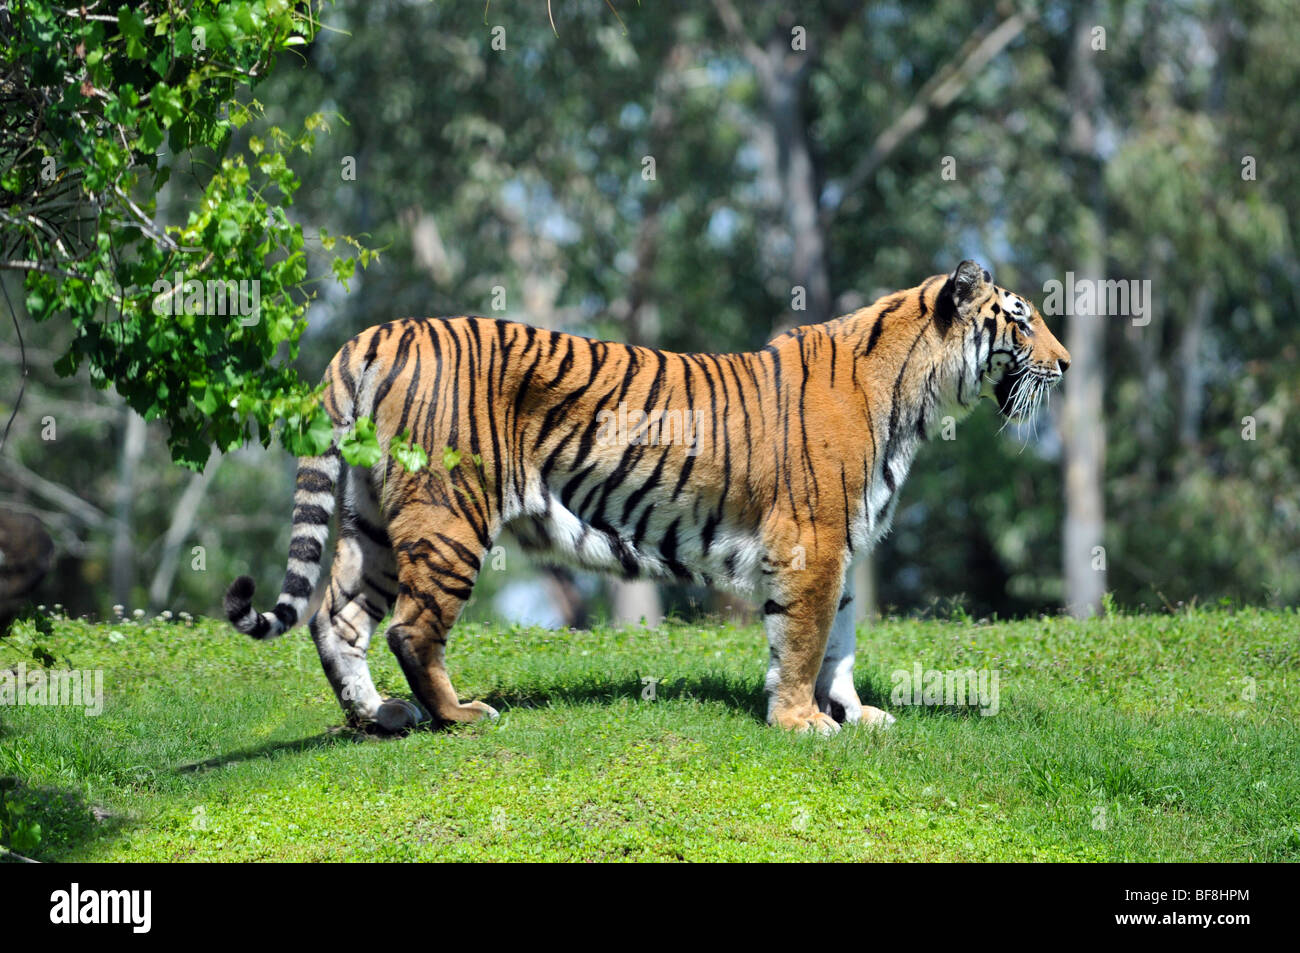 Bengal im genes de stock bengal fotos de stock alamy for Bengala asia